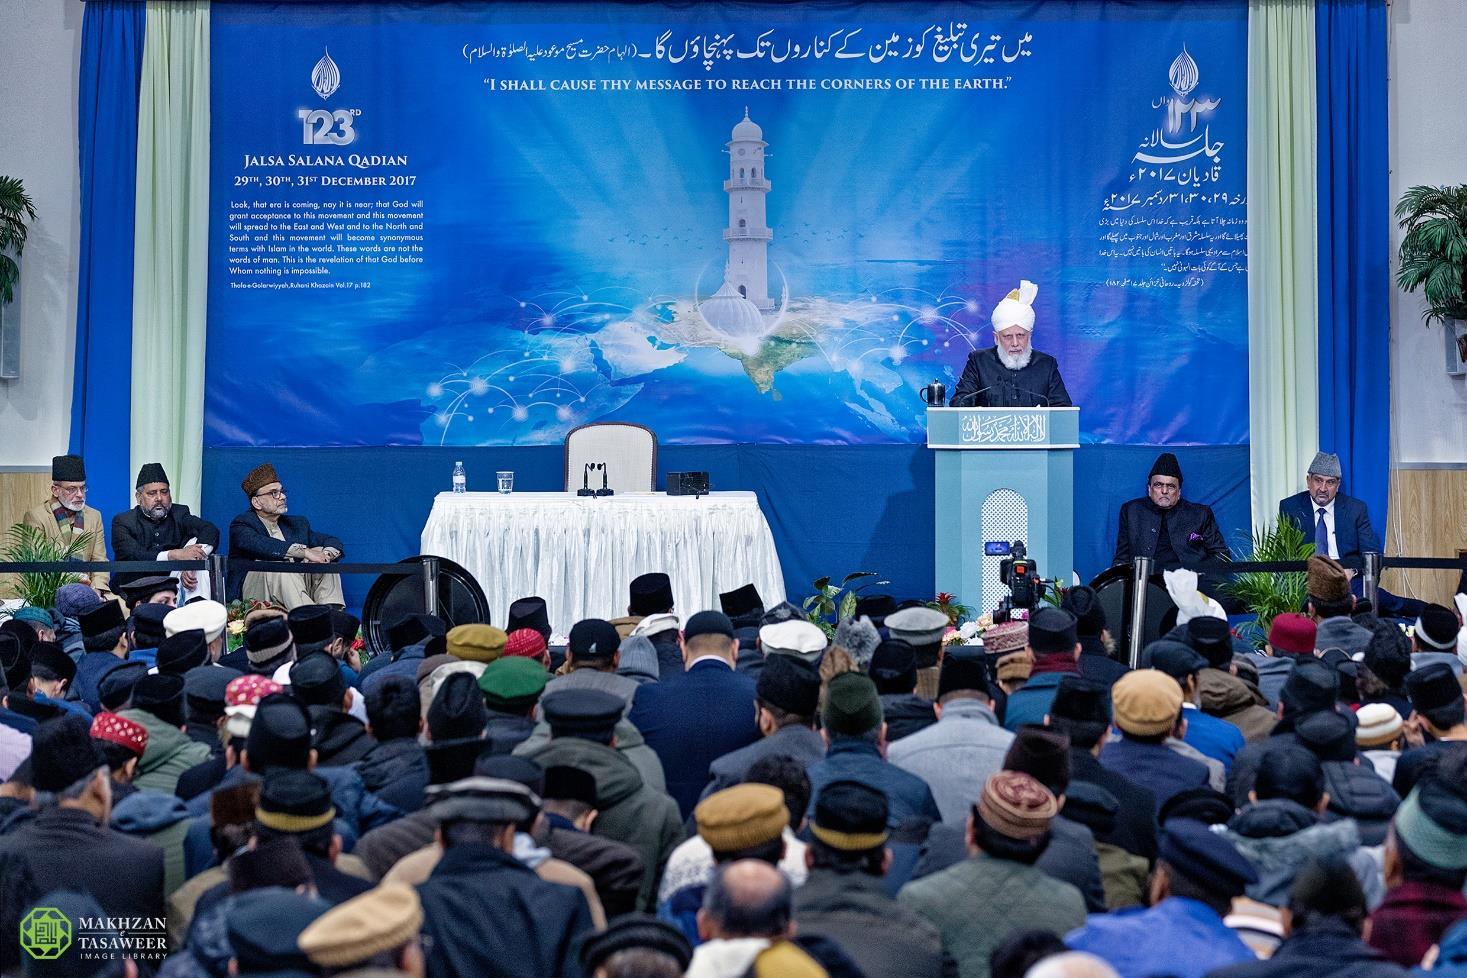 123rd Jalsa Salana Qadian concludes with address by Head of the Ahmadiyya Muslim Community